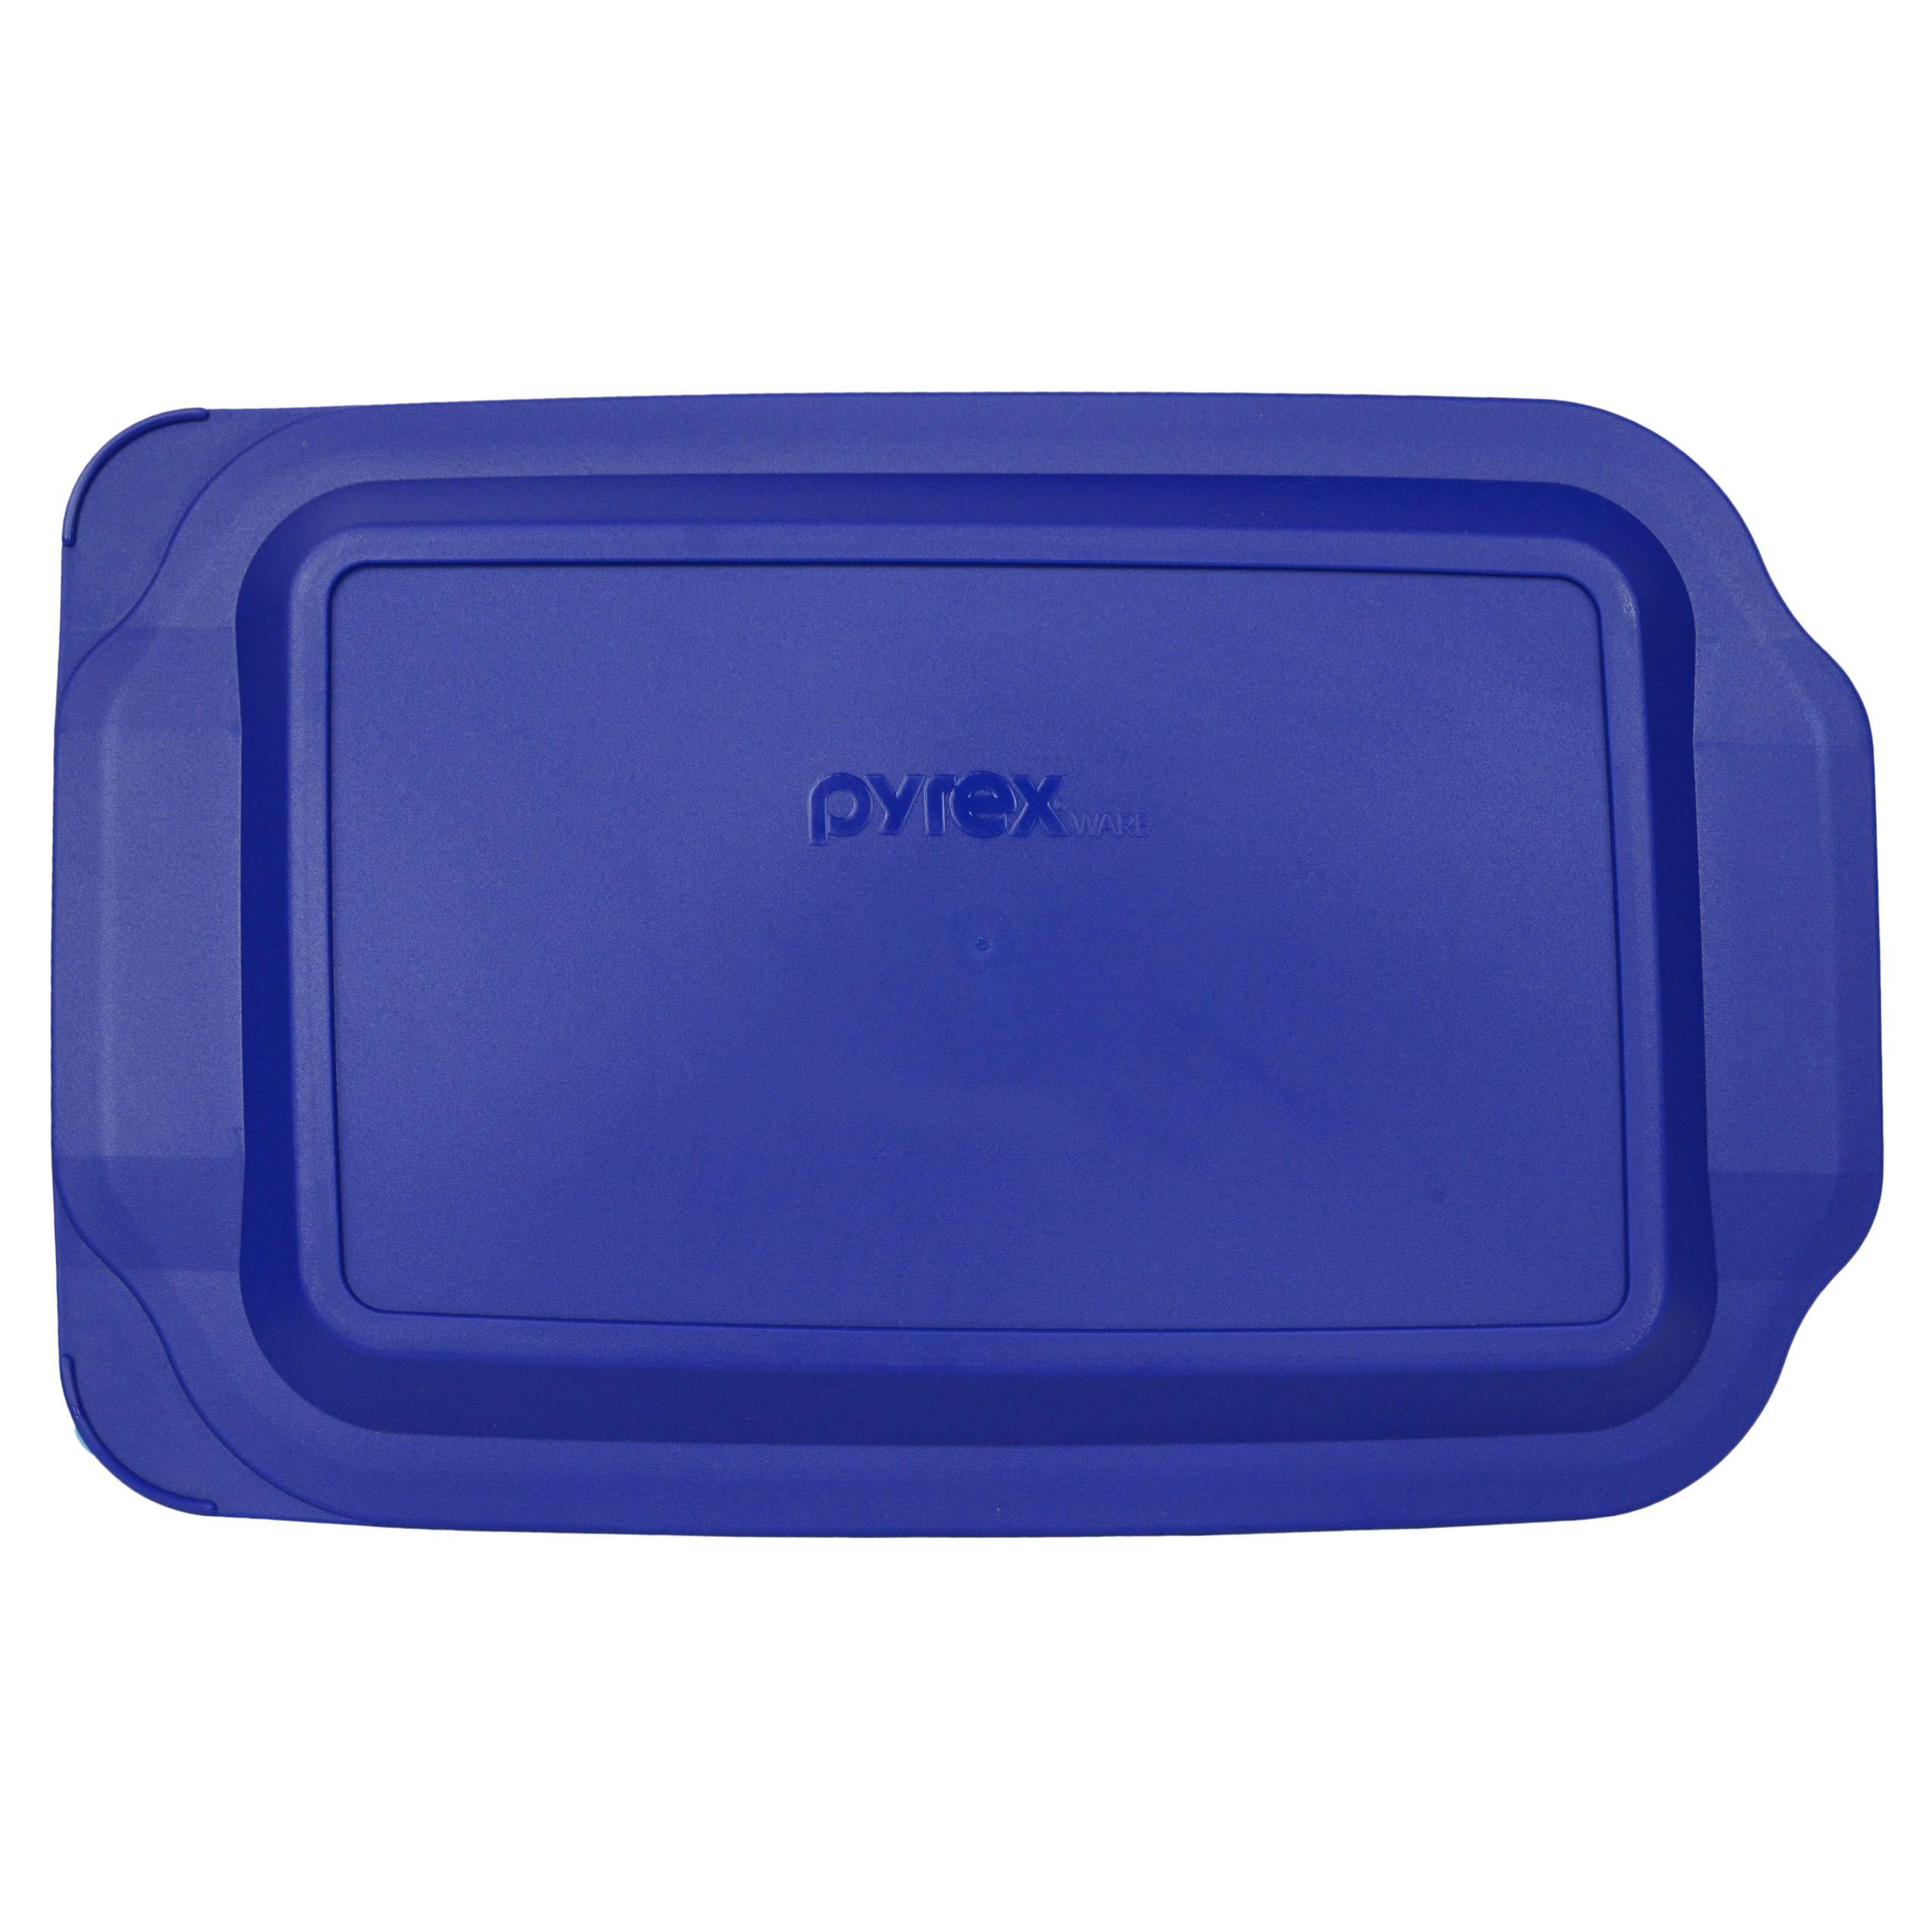 Pyrex 233-PC 3 Quart Blue 9'' x 13'' Baking Dish Lid - Will NOT Fit Easy Grab Baking Dish